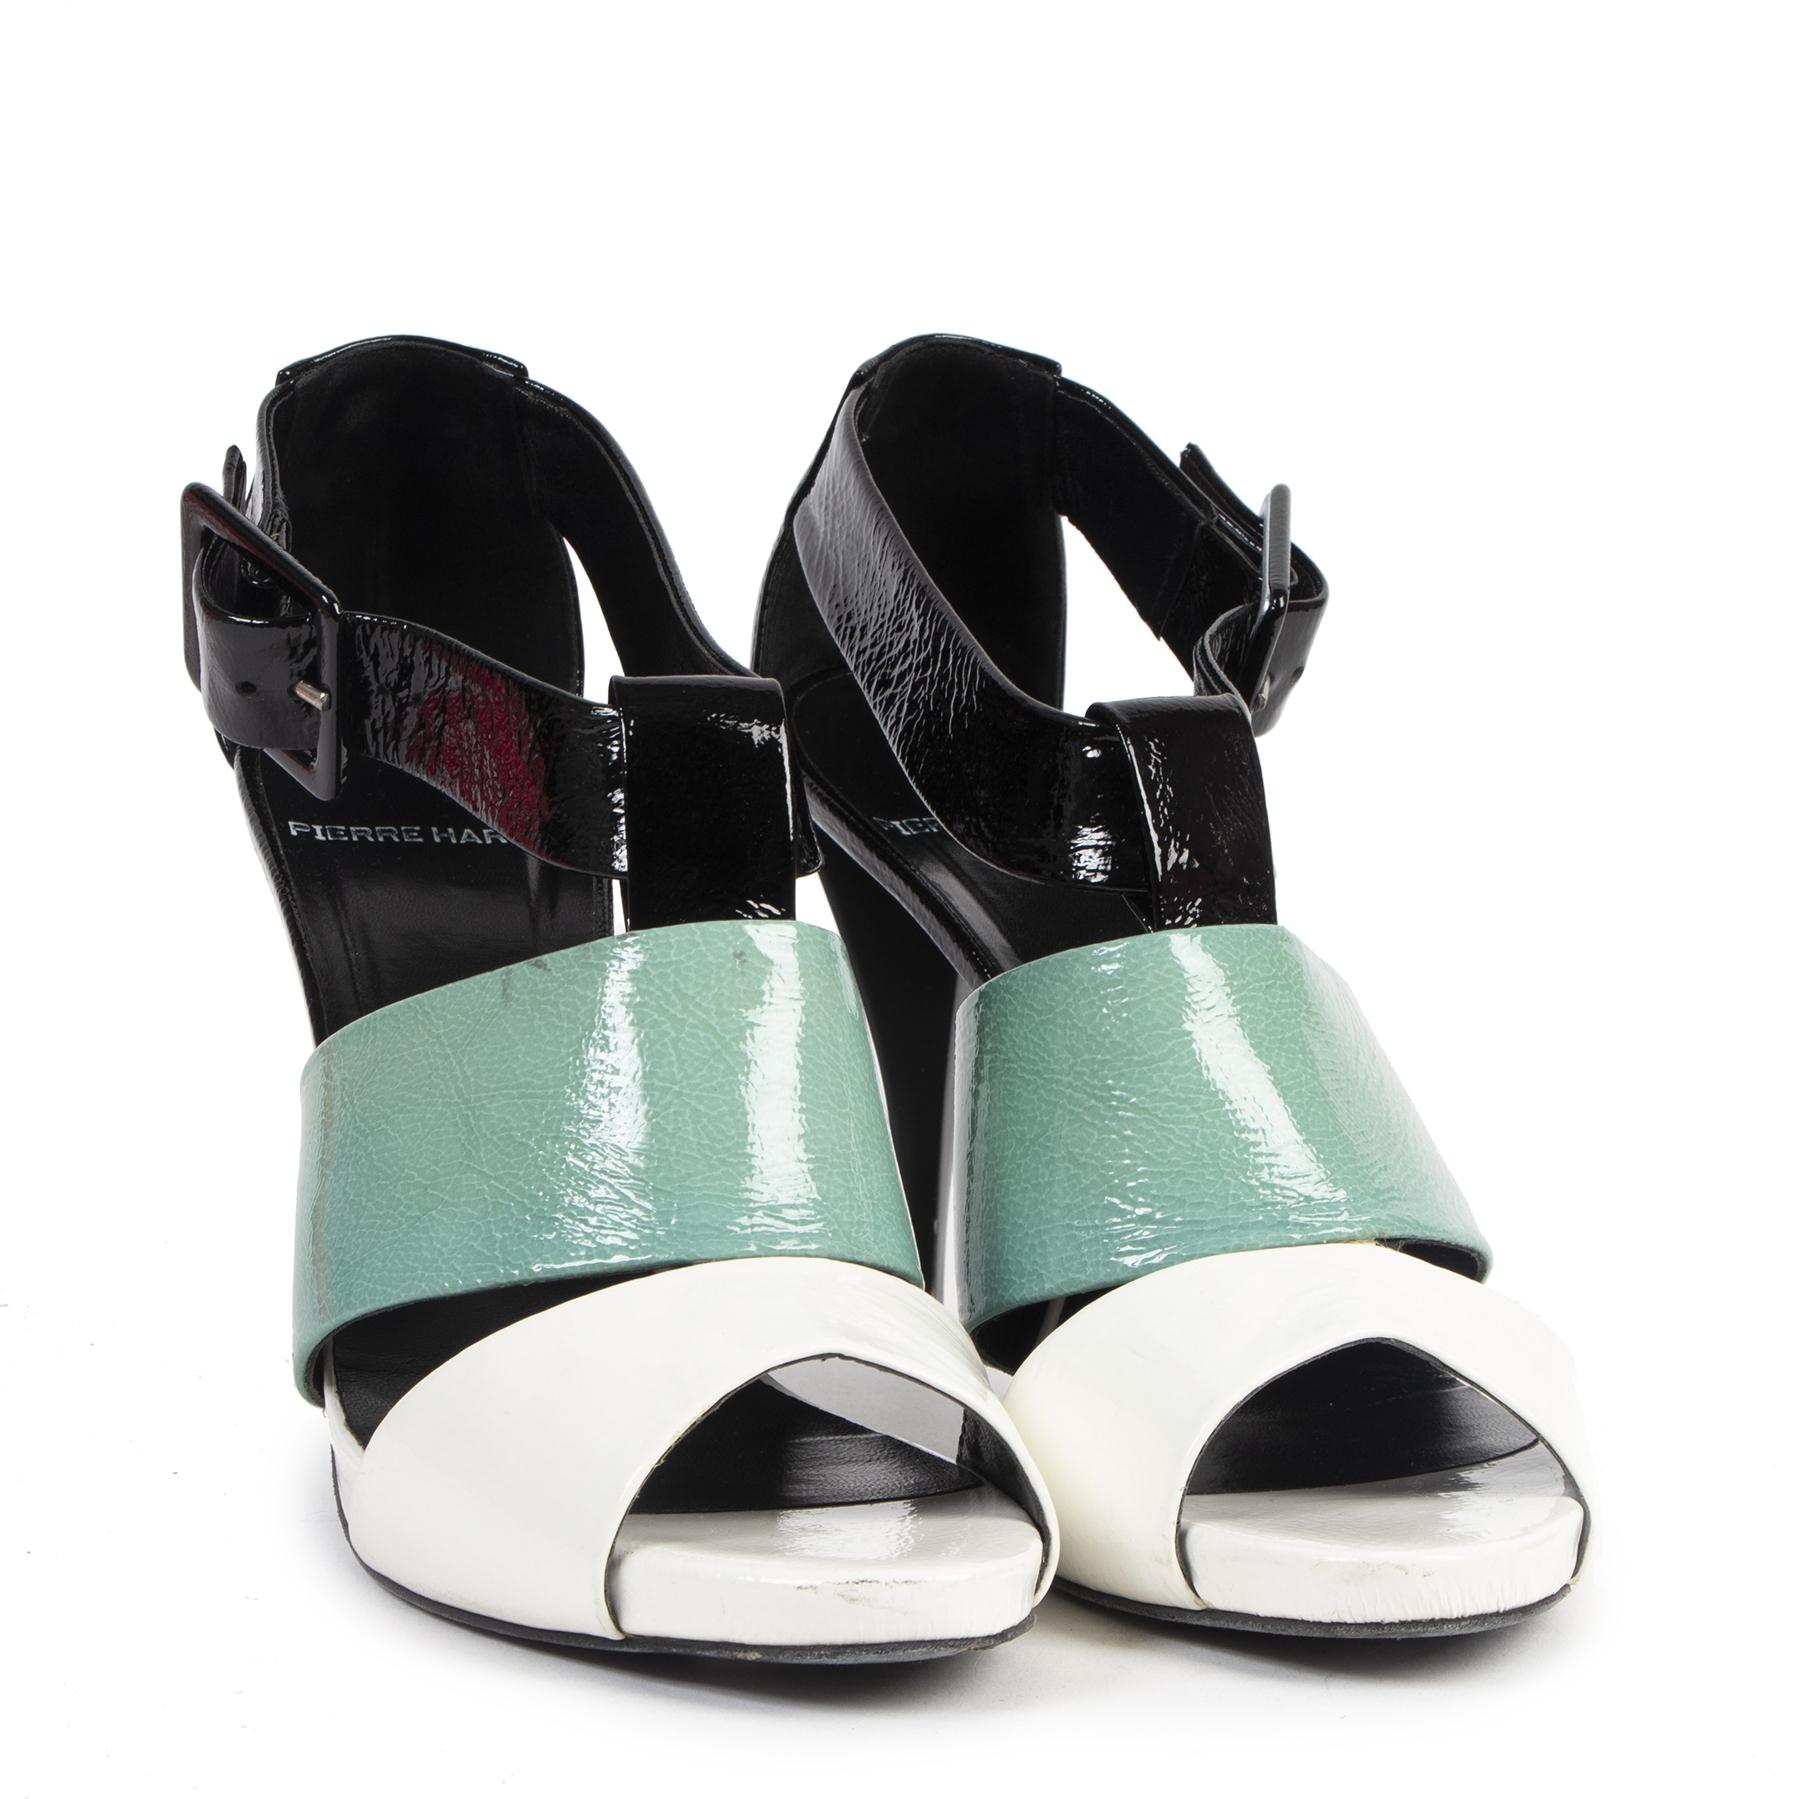 Authentic secondhand Pierre Hardy Tricolor Patent Leather Sandal Heels - Size 39,5  designer luxury vintage webshop fashion